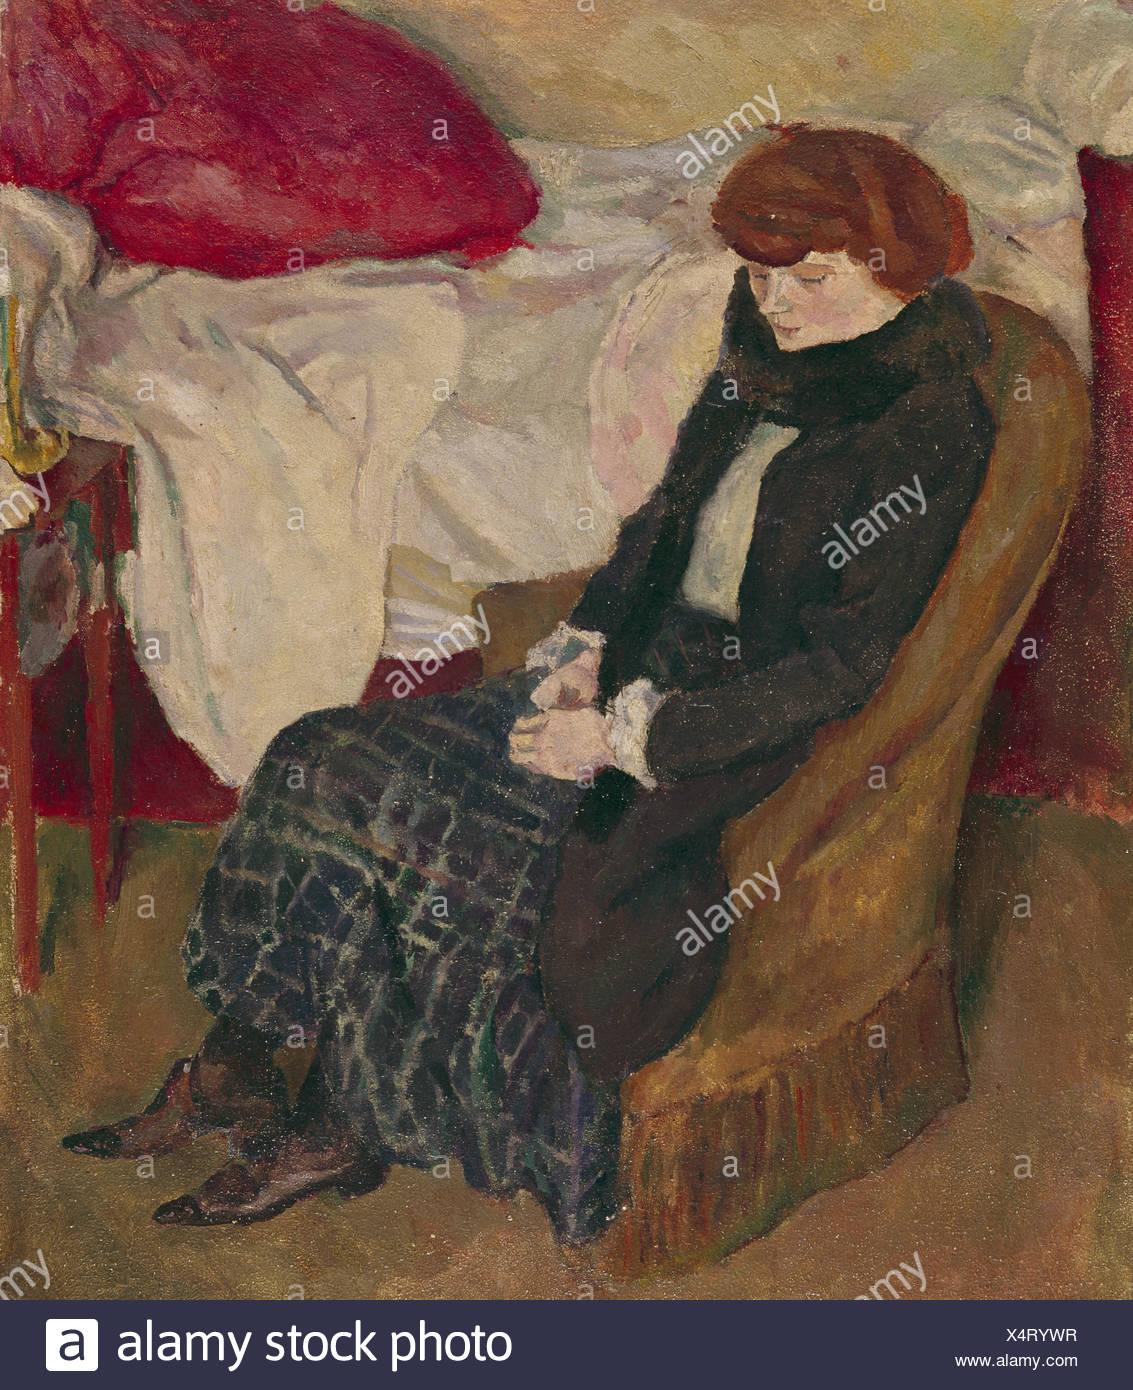 "fine arts, Pascin, Jules (1885 - 1930), ""Poverty"", Saarlandmuseum, Saarbrucken, impressionism, woman, 20th century, Stock Photo"